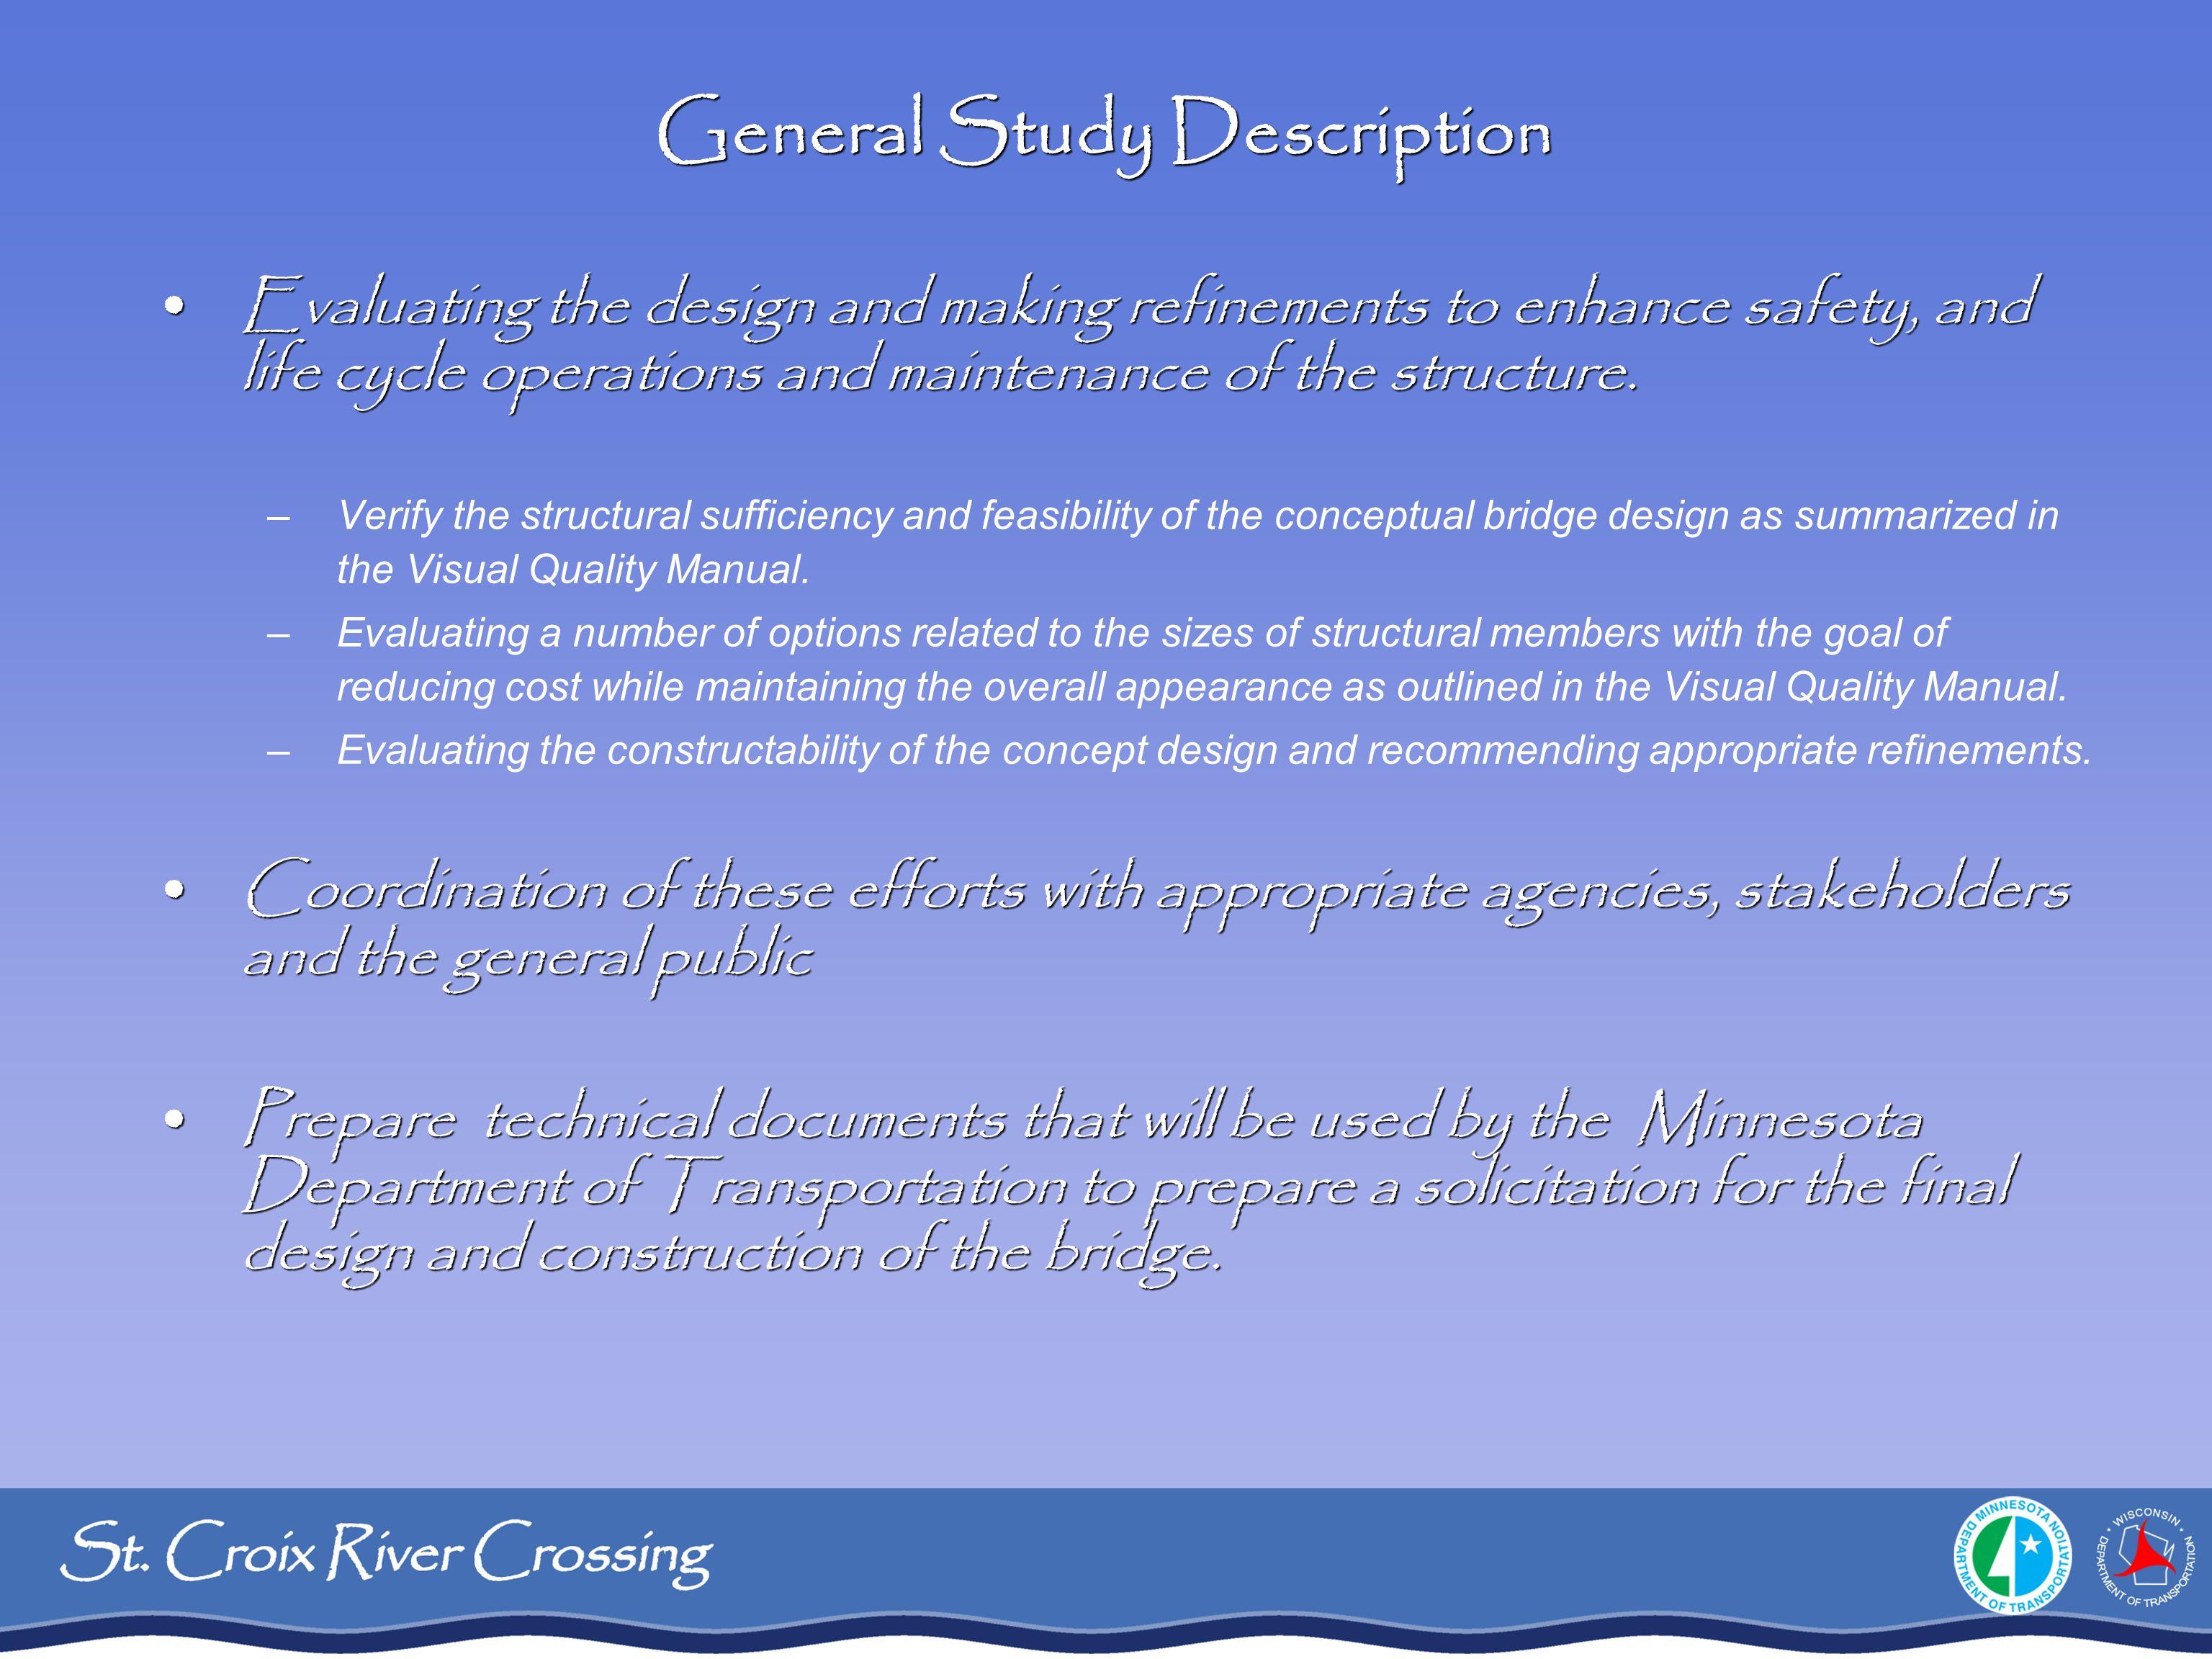 General Study Description